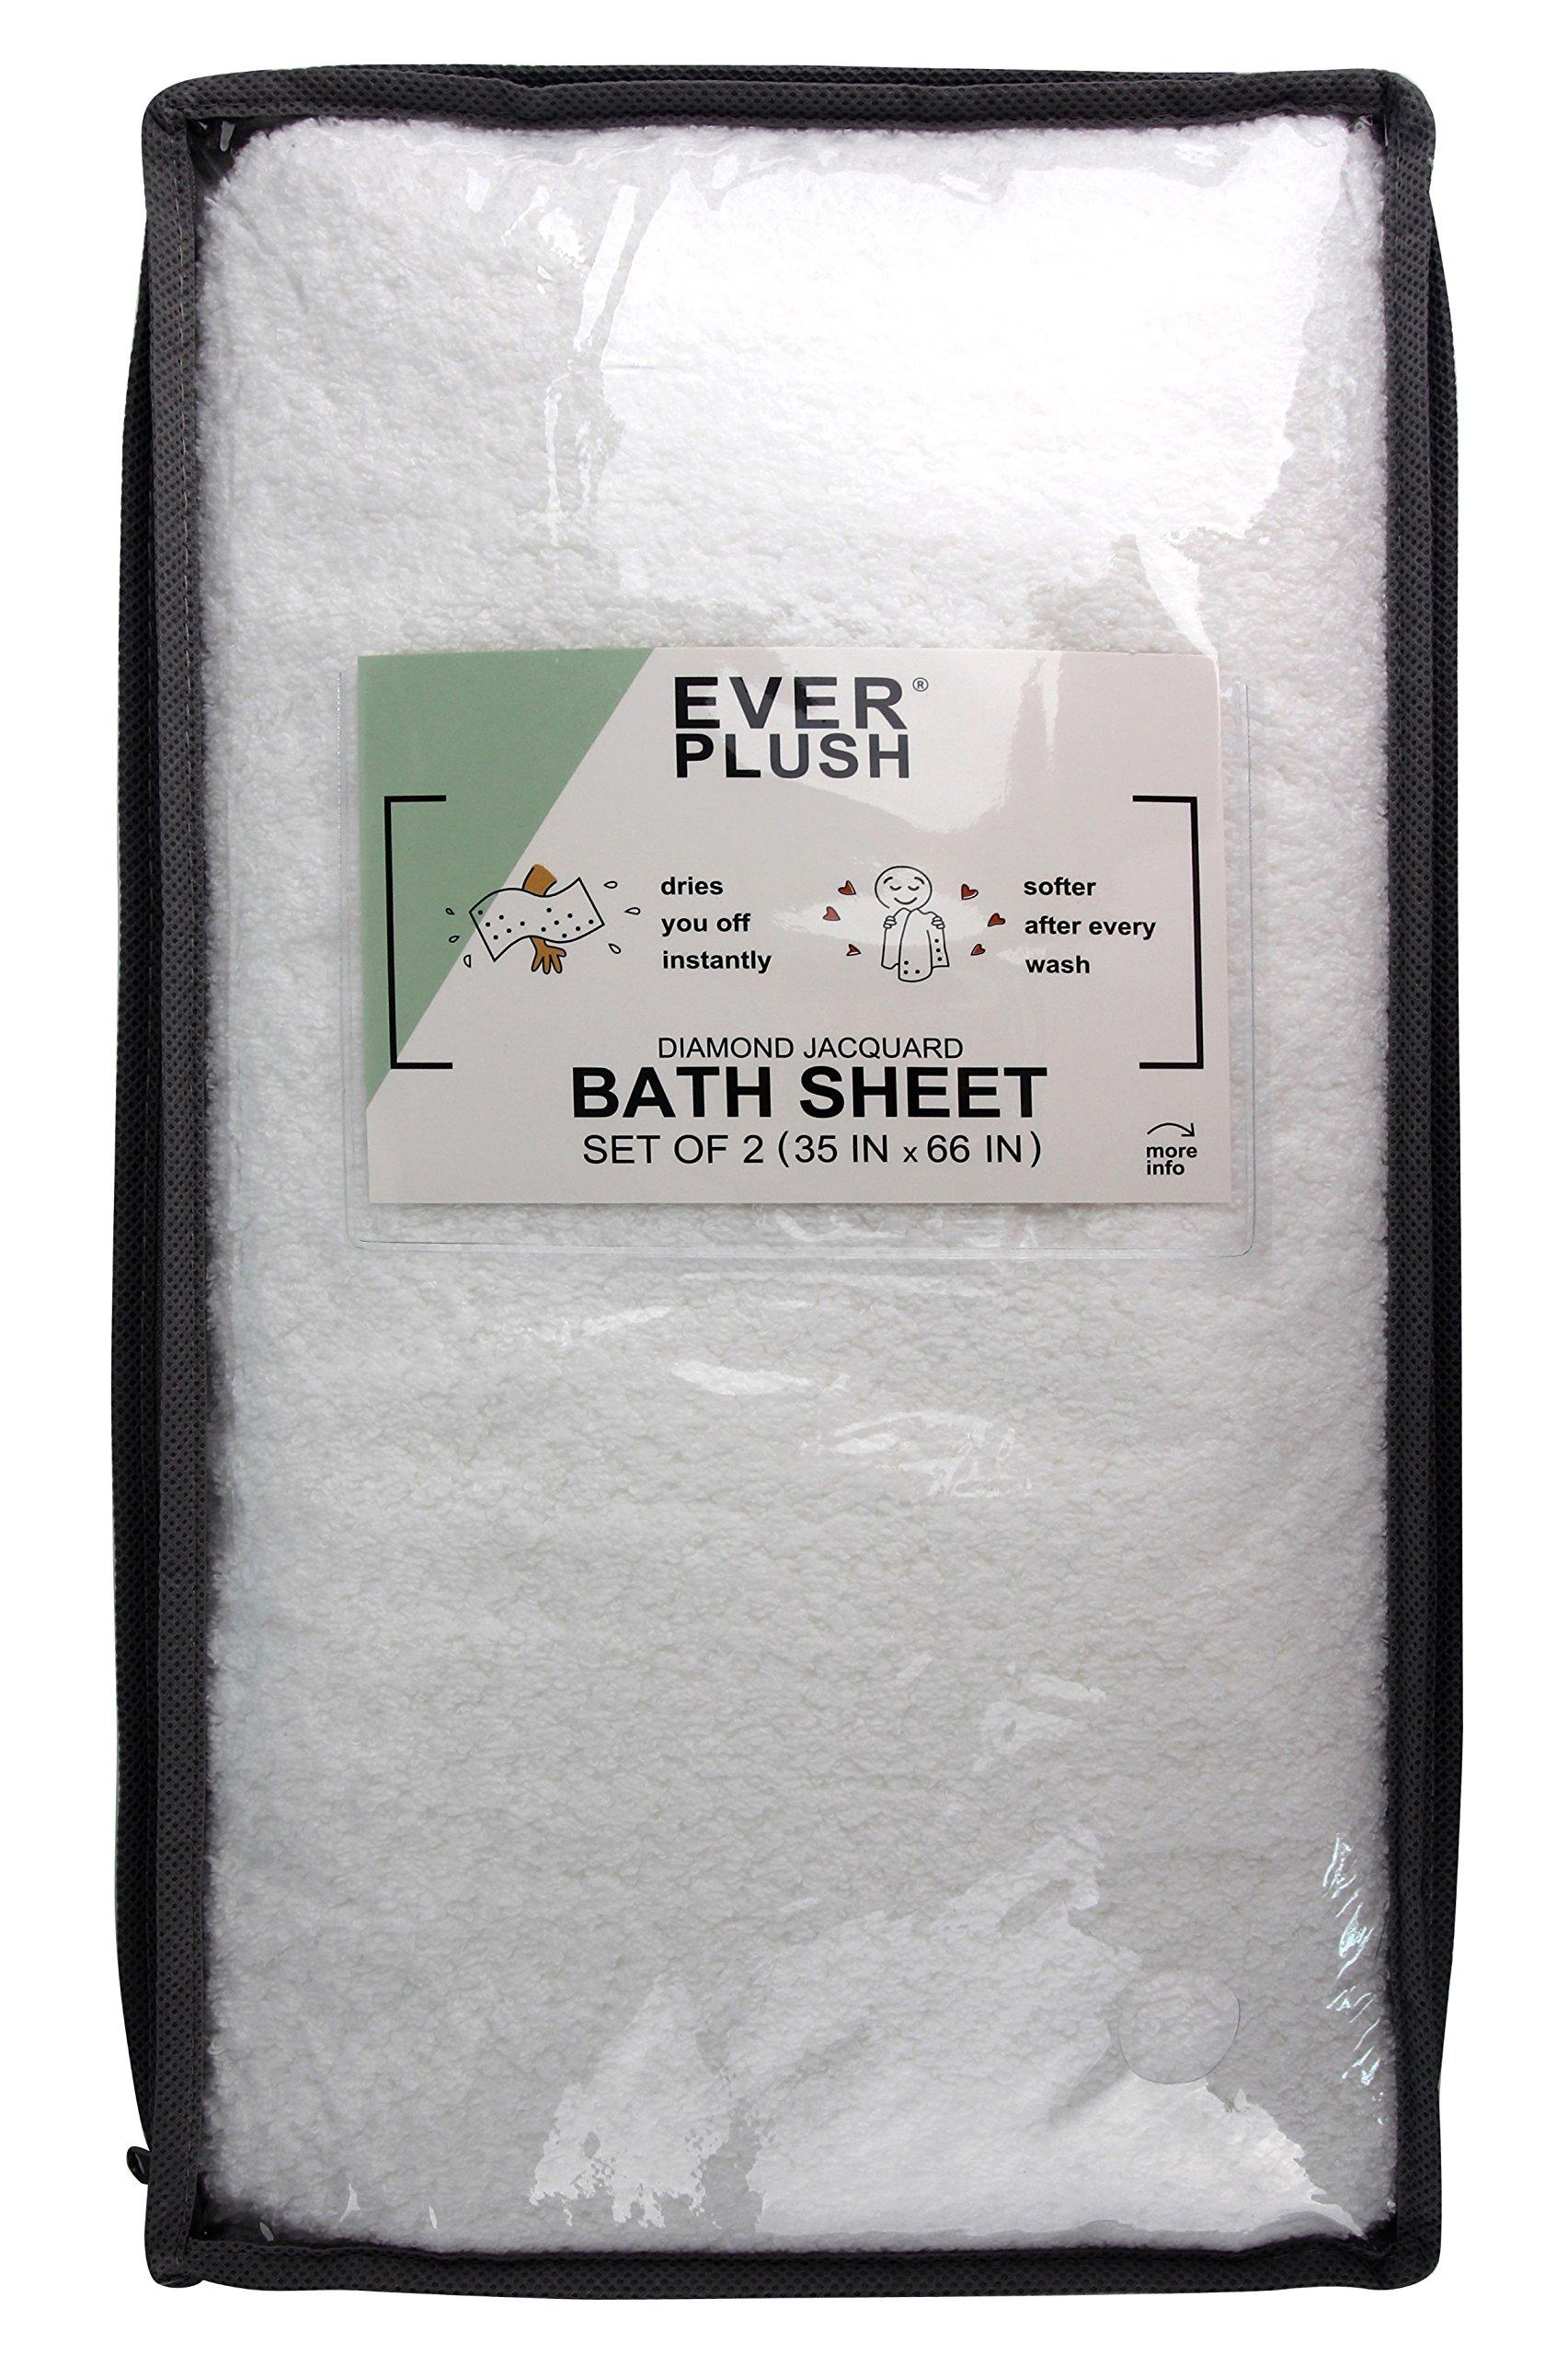 Everplush Diamond Jacquard Bath Sheet 2 Pack in White by Everplush (Image #6)